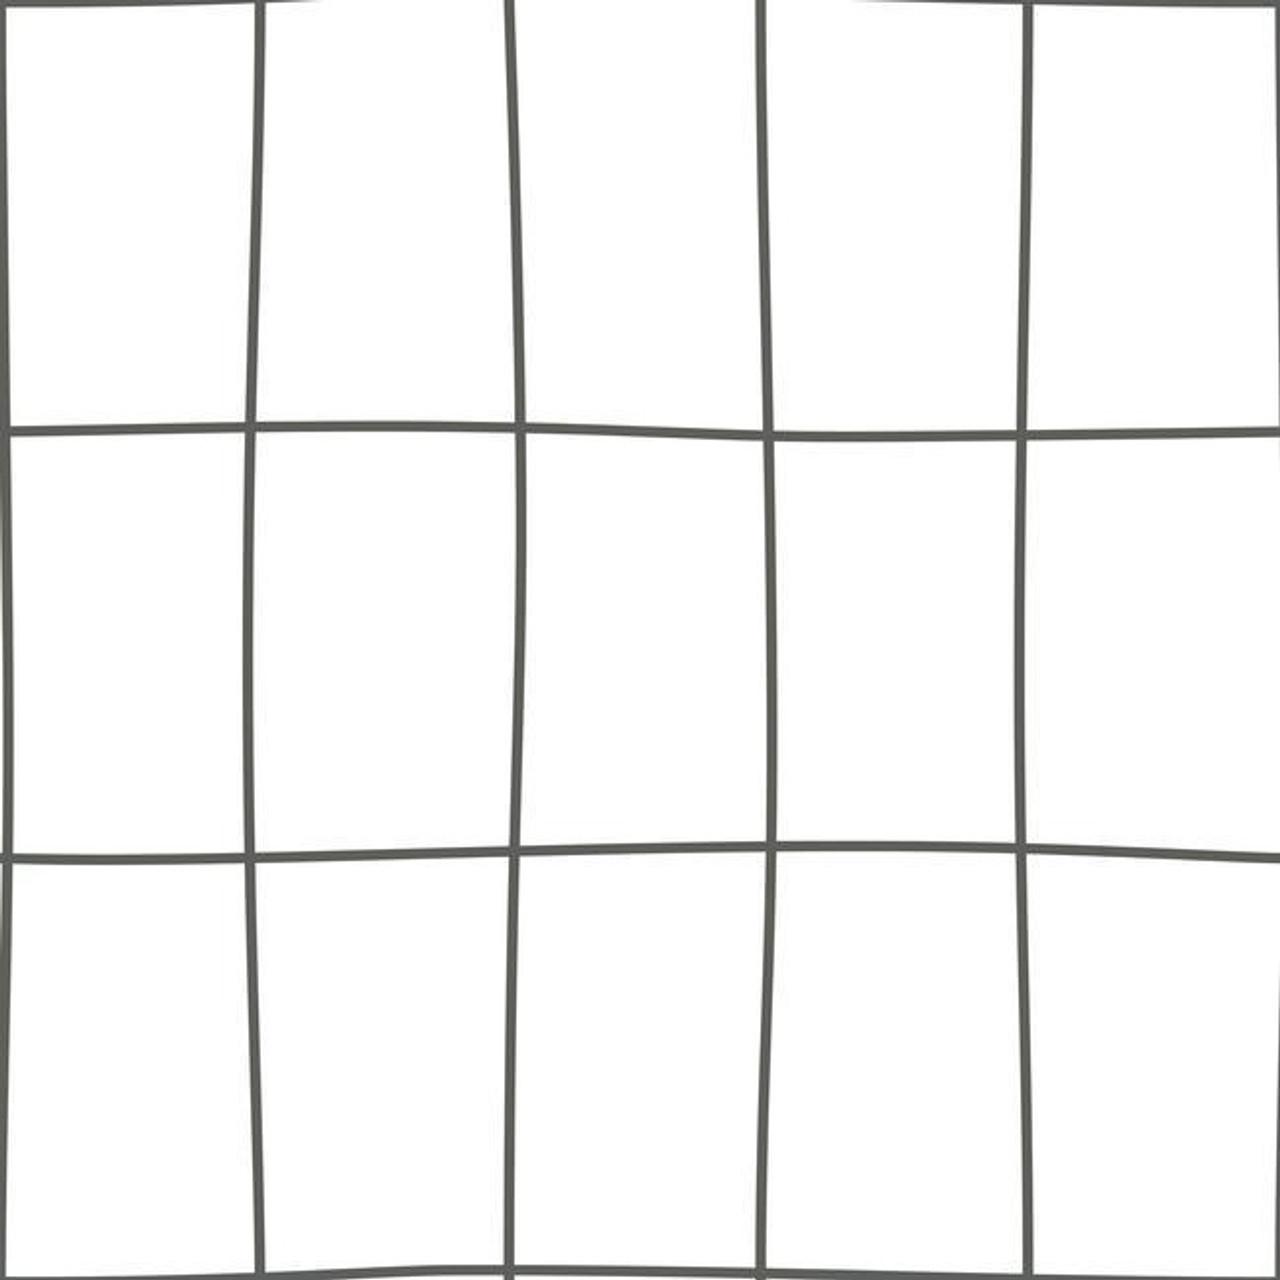 York Wallcoverings Ce3922 Off The Grid Wallpaper Black White Blacks The Savvy Decorator